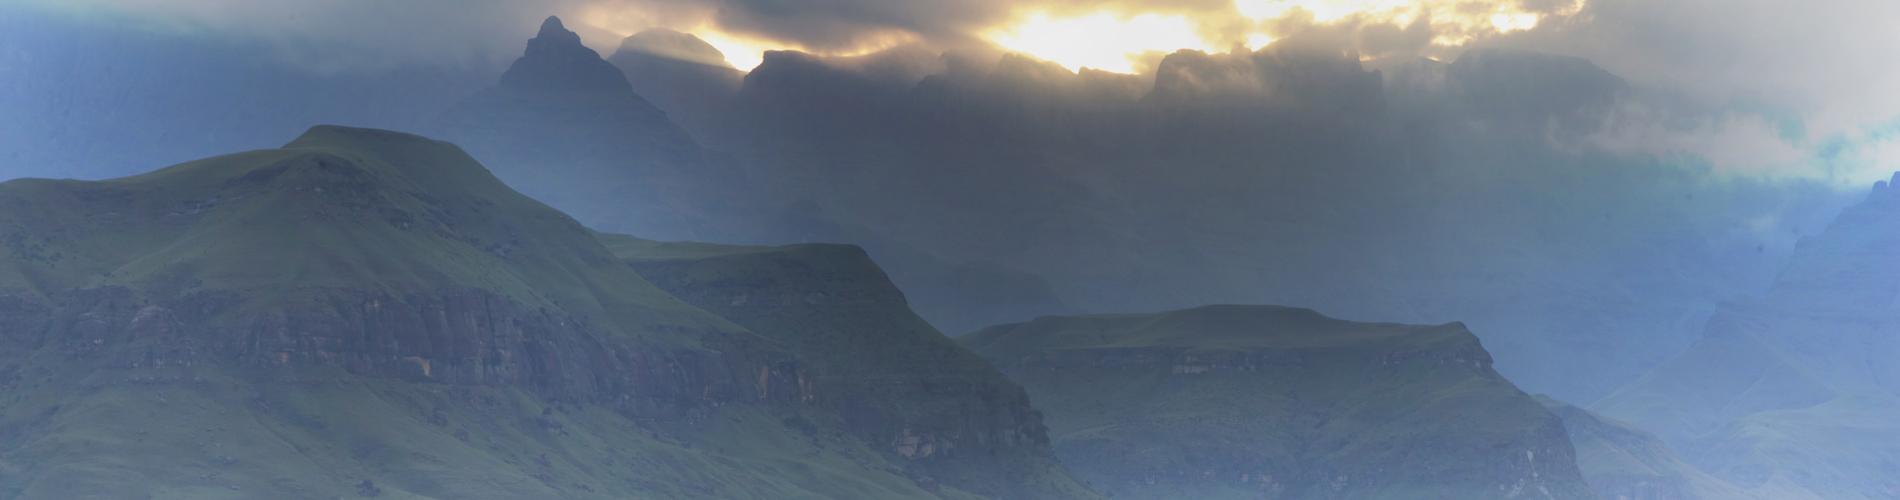 ethos Drakensberg cathedral peak resized website